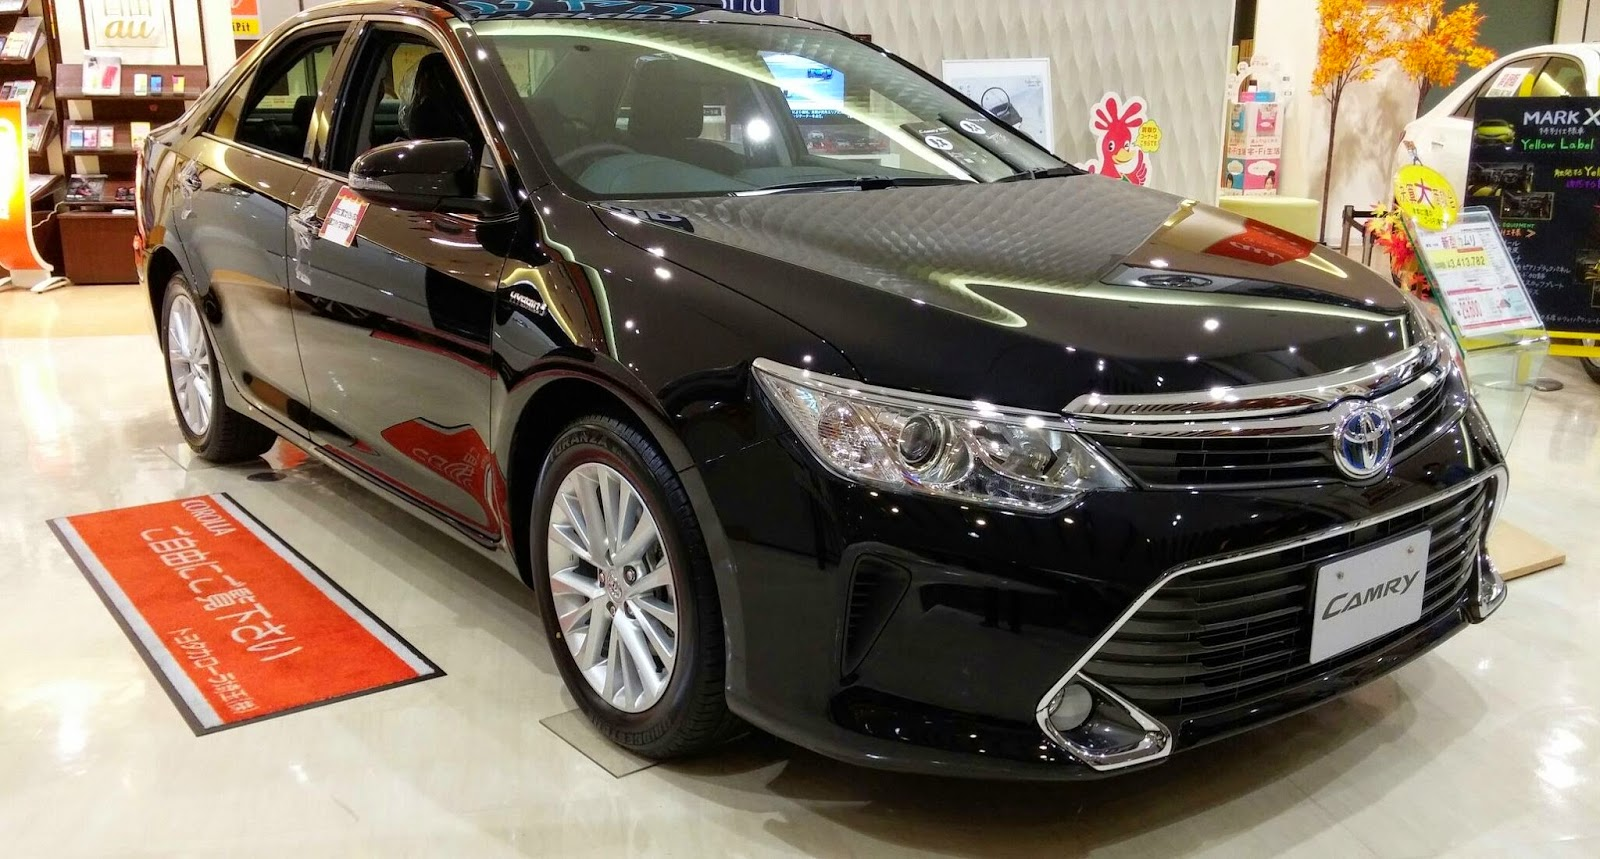 all new camry hybrid indonesia spesifikasi grand veloz 2015 thomas bondan blog inilah penyebab mobil jadi